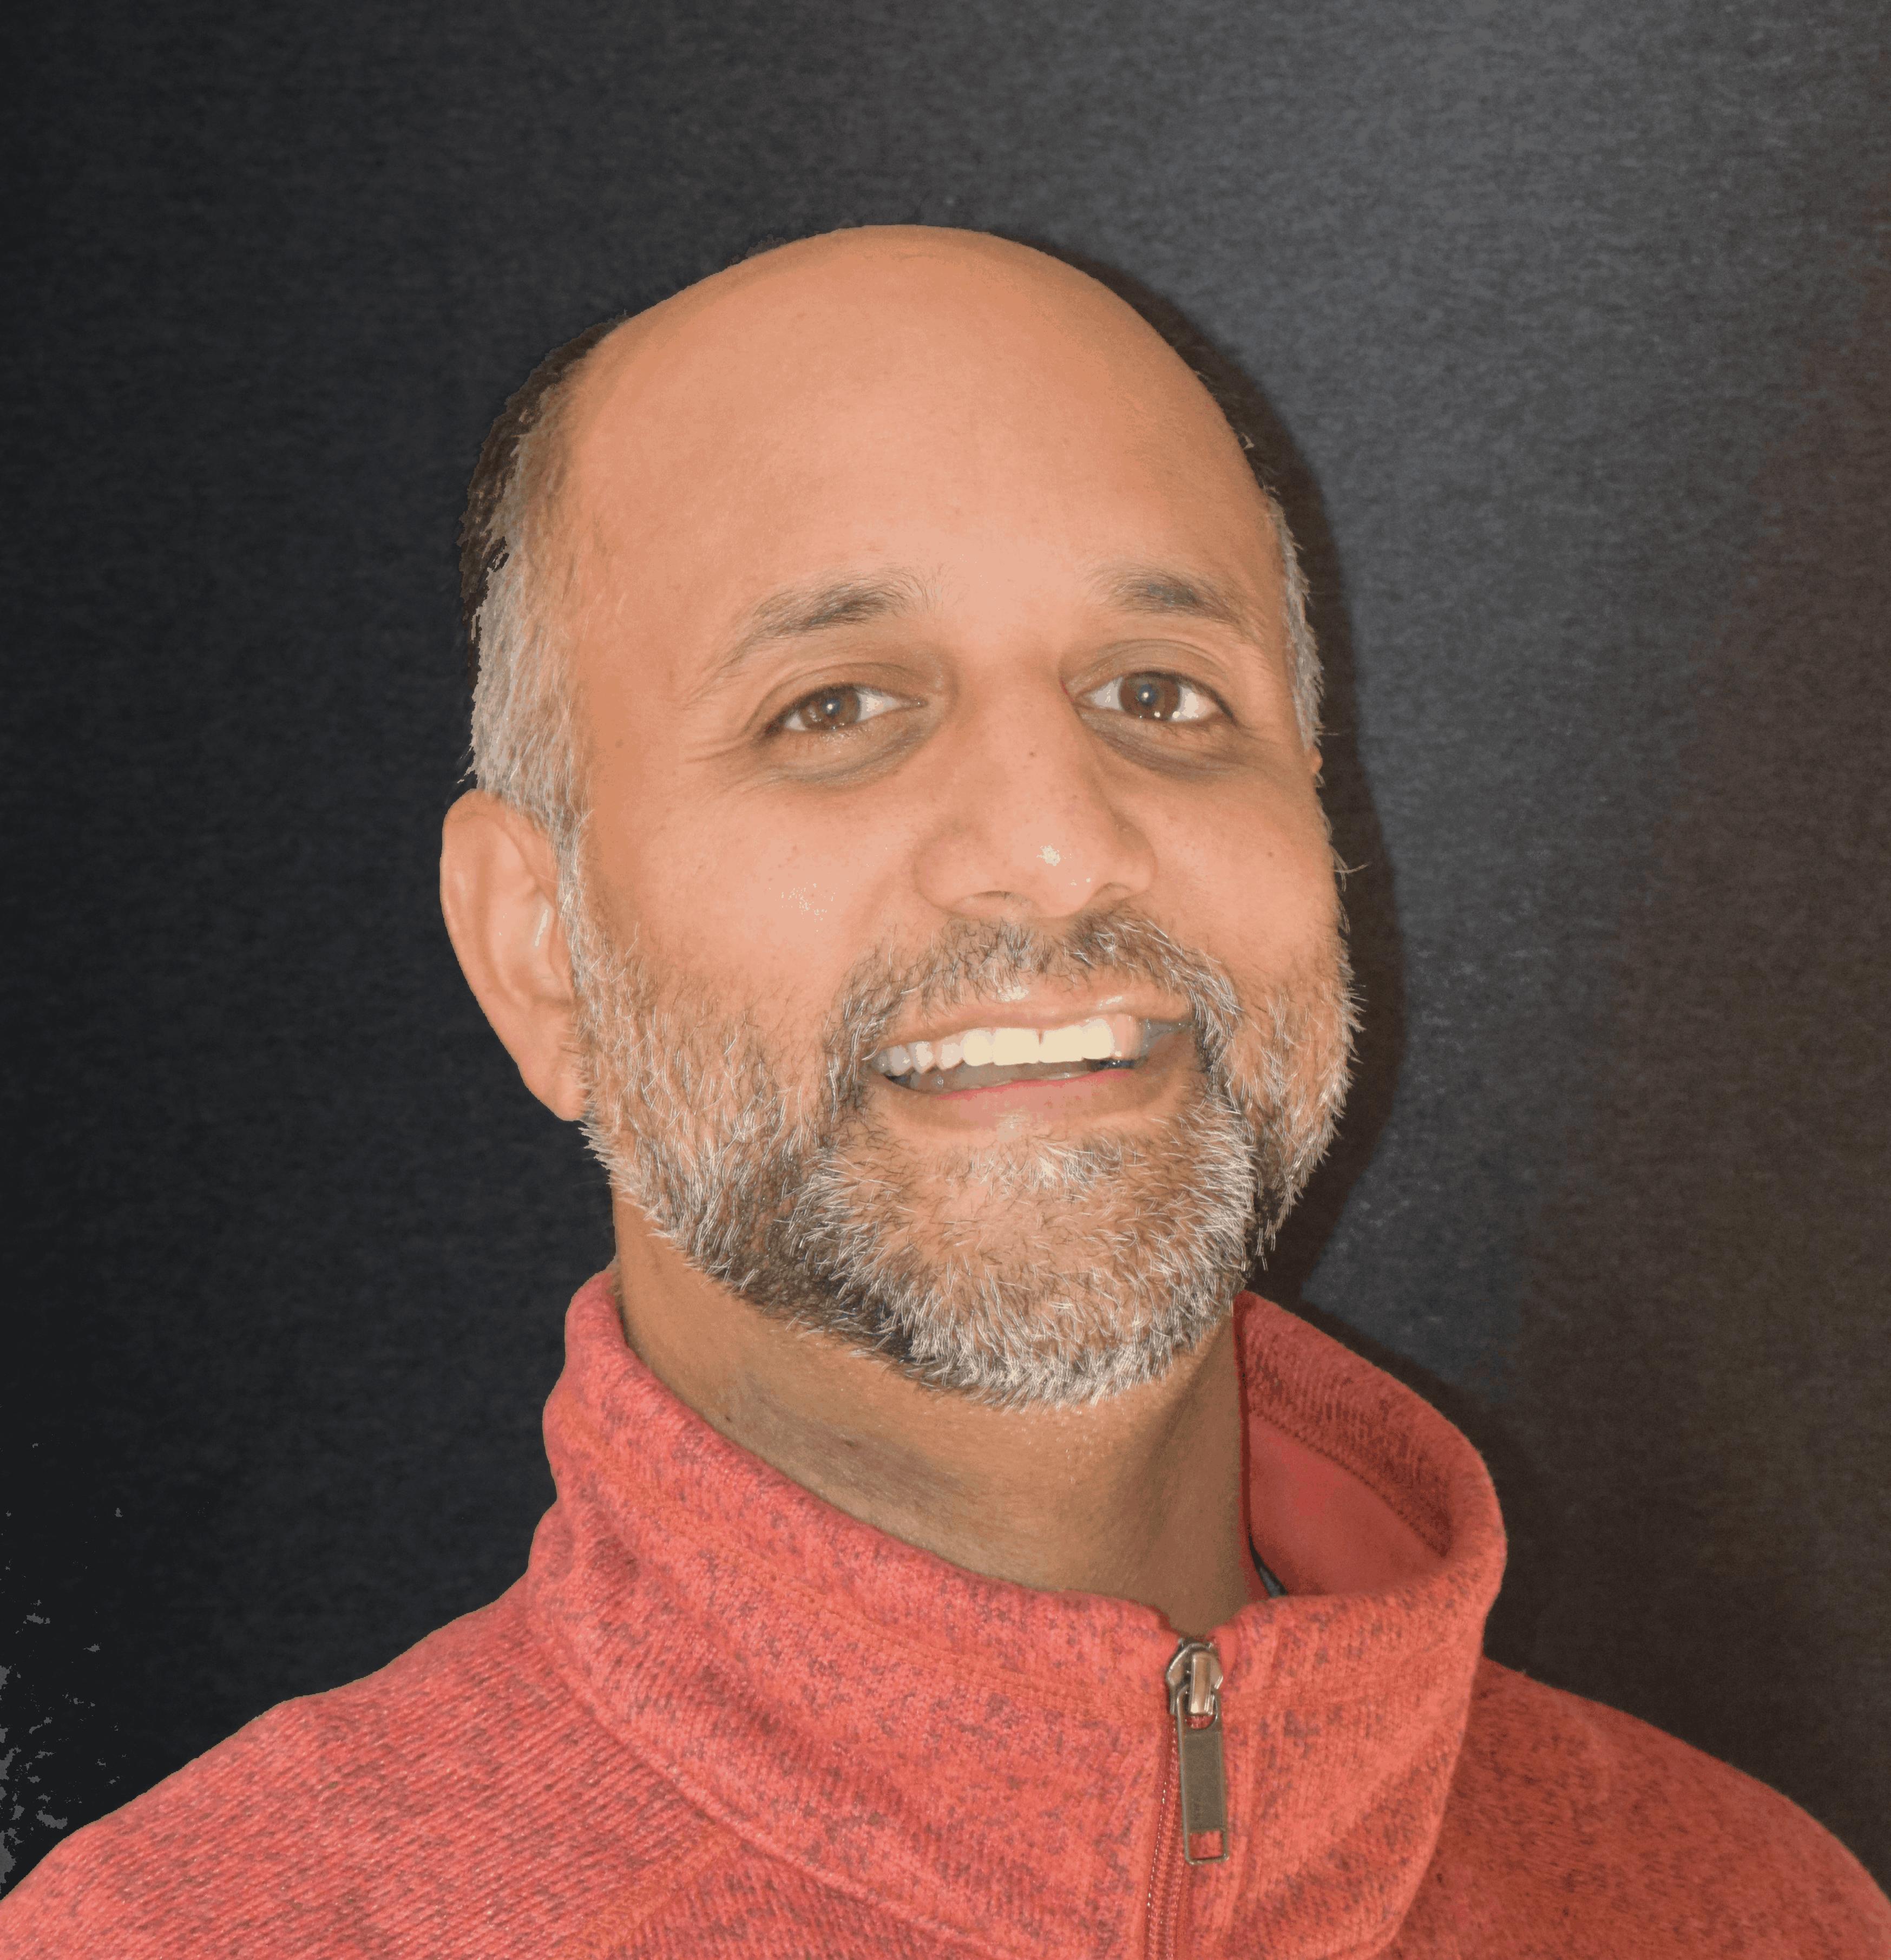 Vivek's headshot